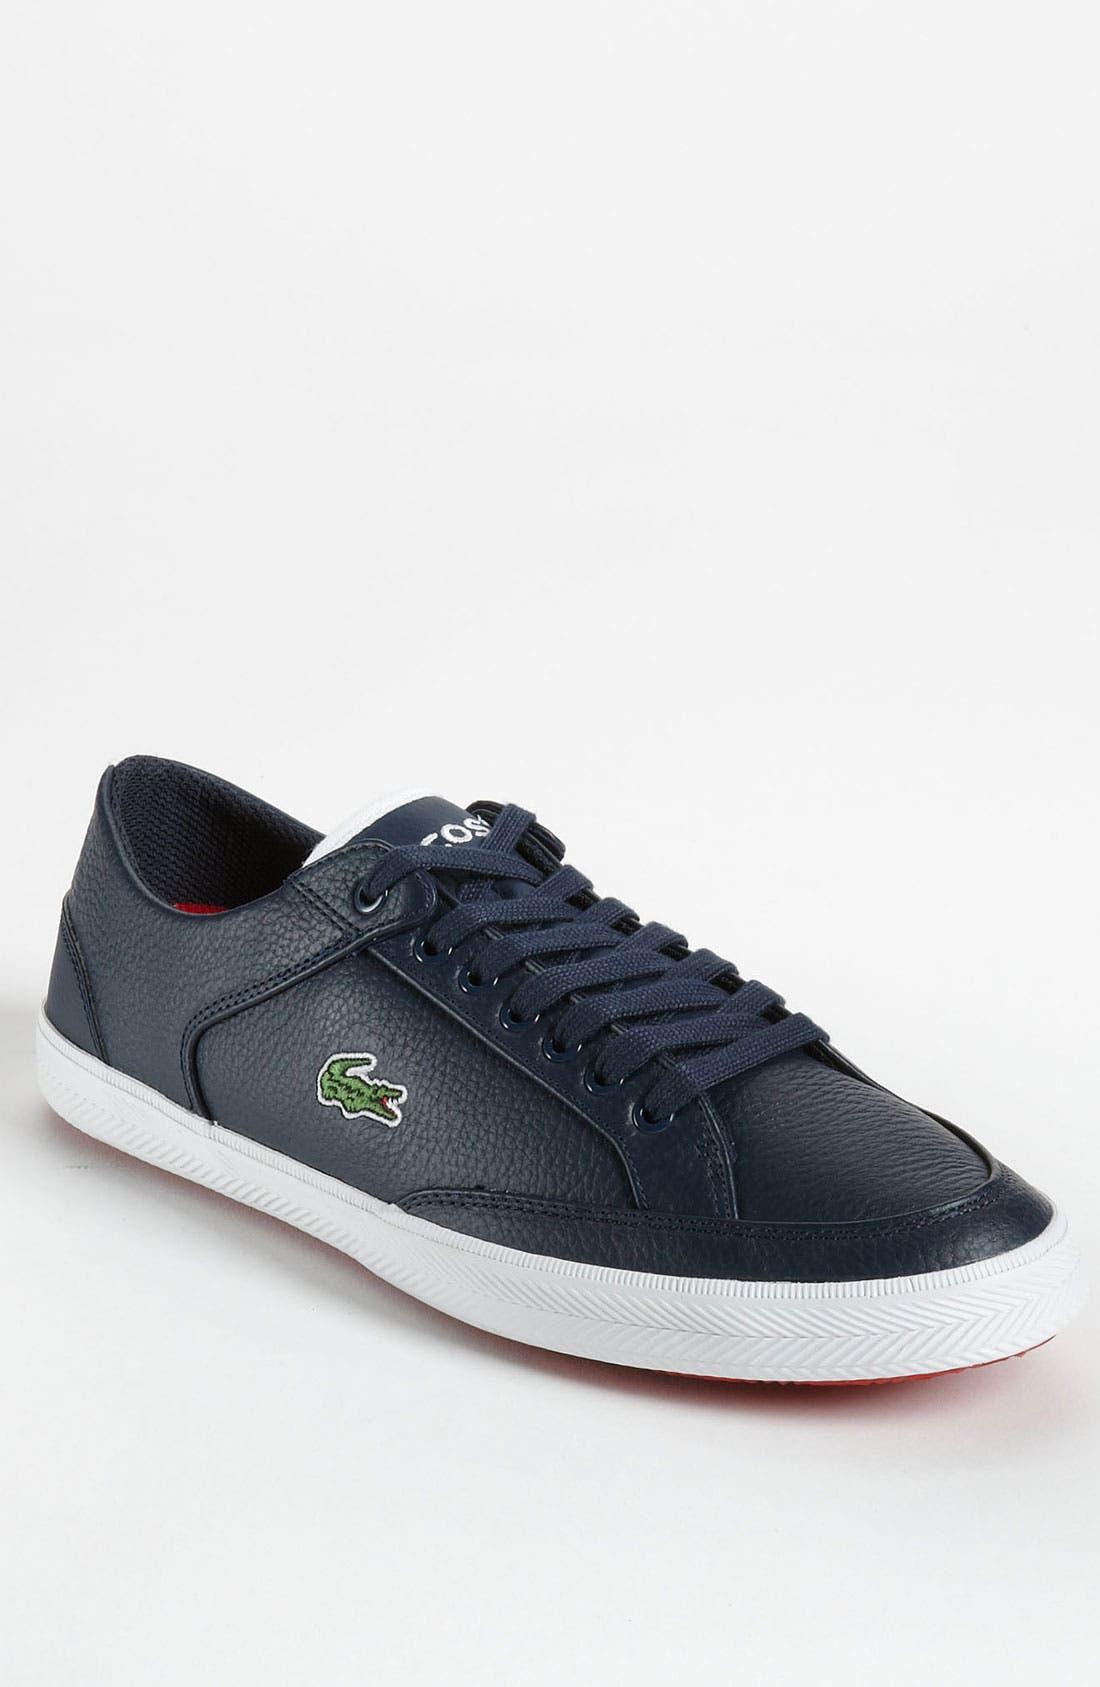 Alternate Image 1 Selected - Lacoste 'Haneda CIW' Sneaker (Online Exclusive)